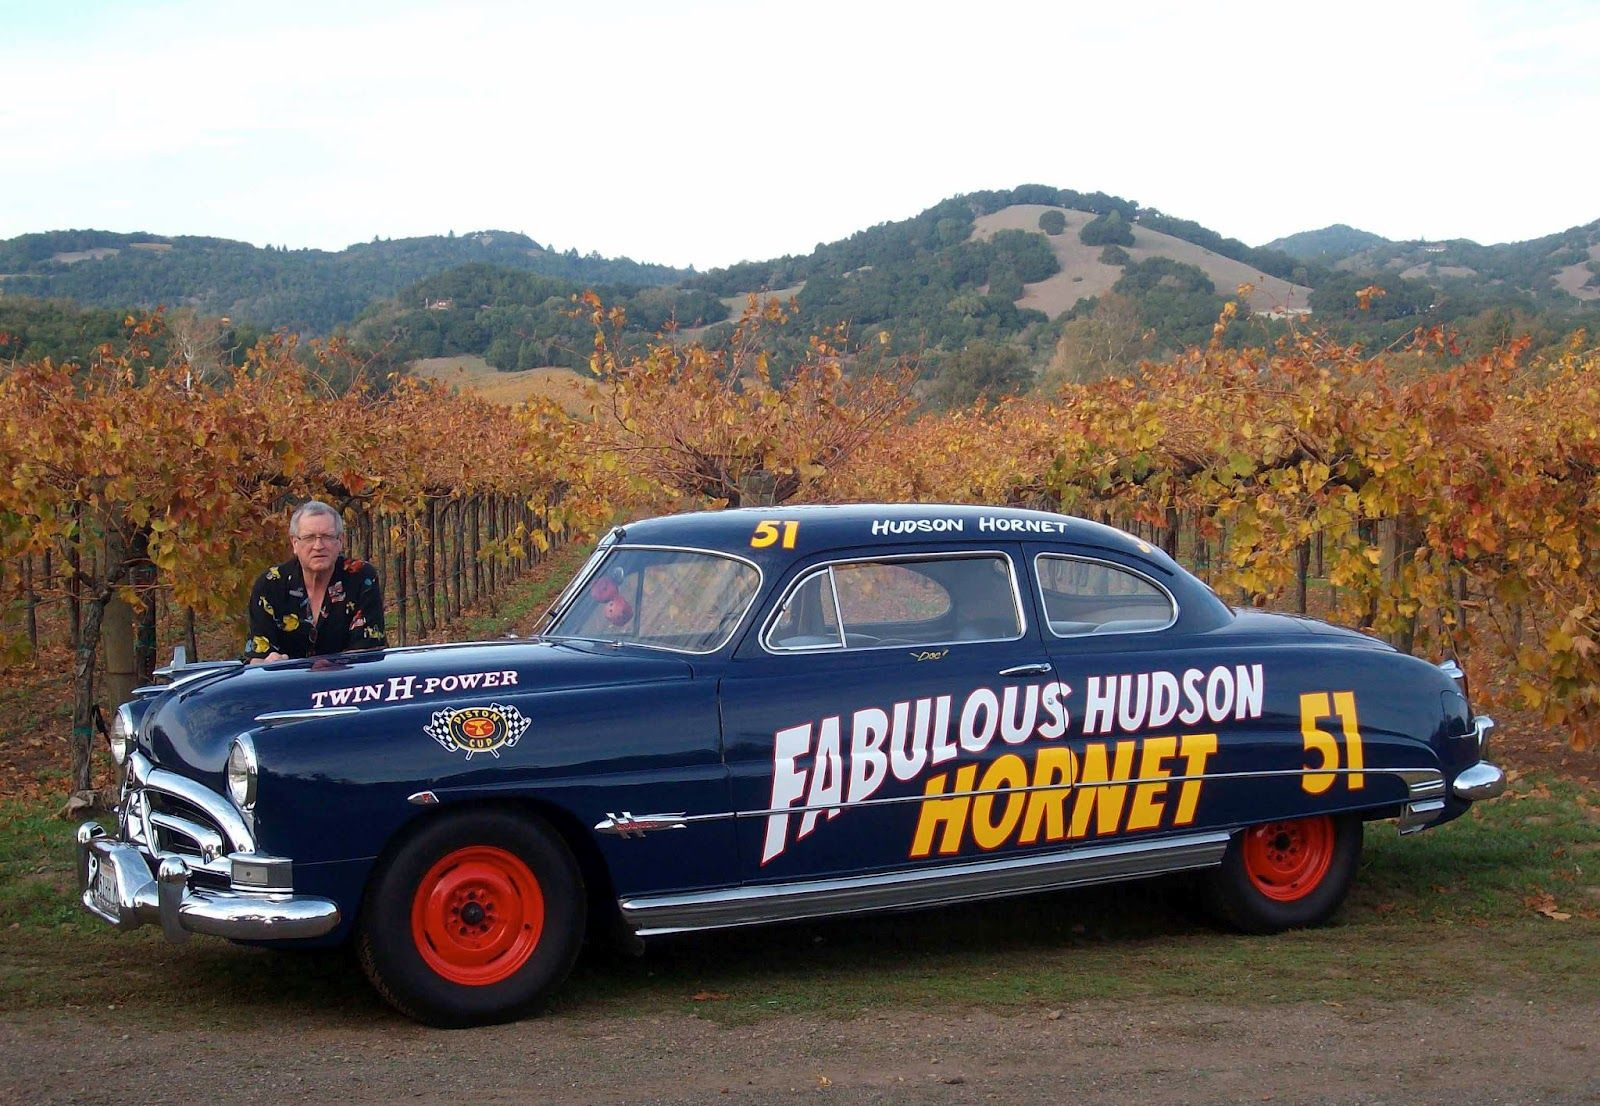 Real Hudson Hornet Cool Carros Carros Tunados Carros Incriveis